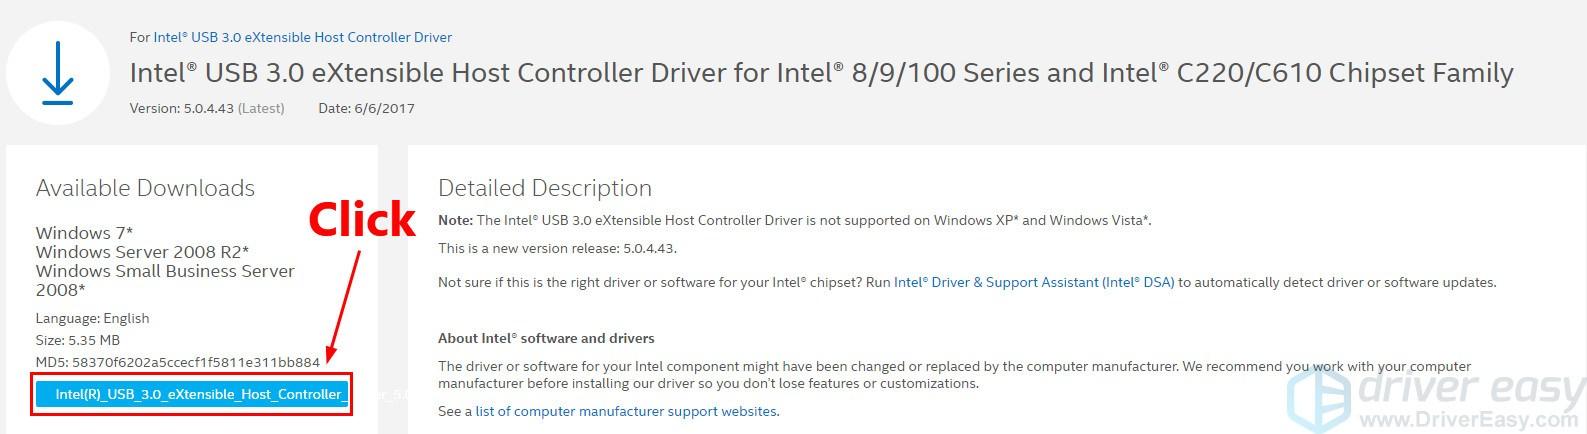 intel® usb 3.0 extensible host controller driver windows xp